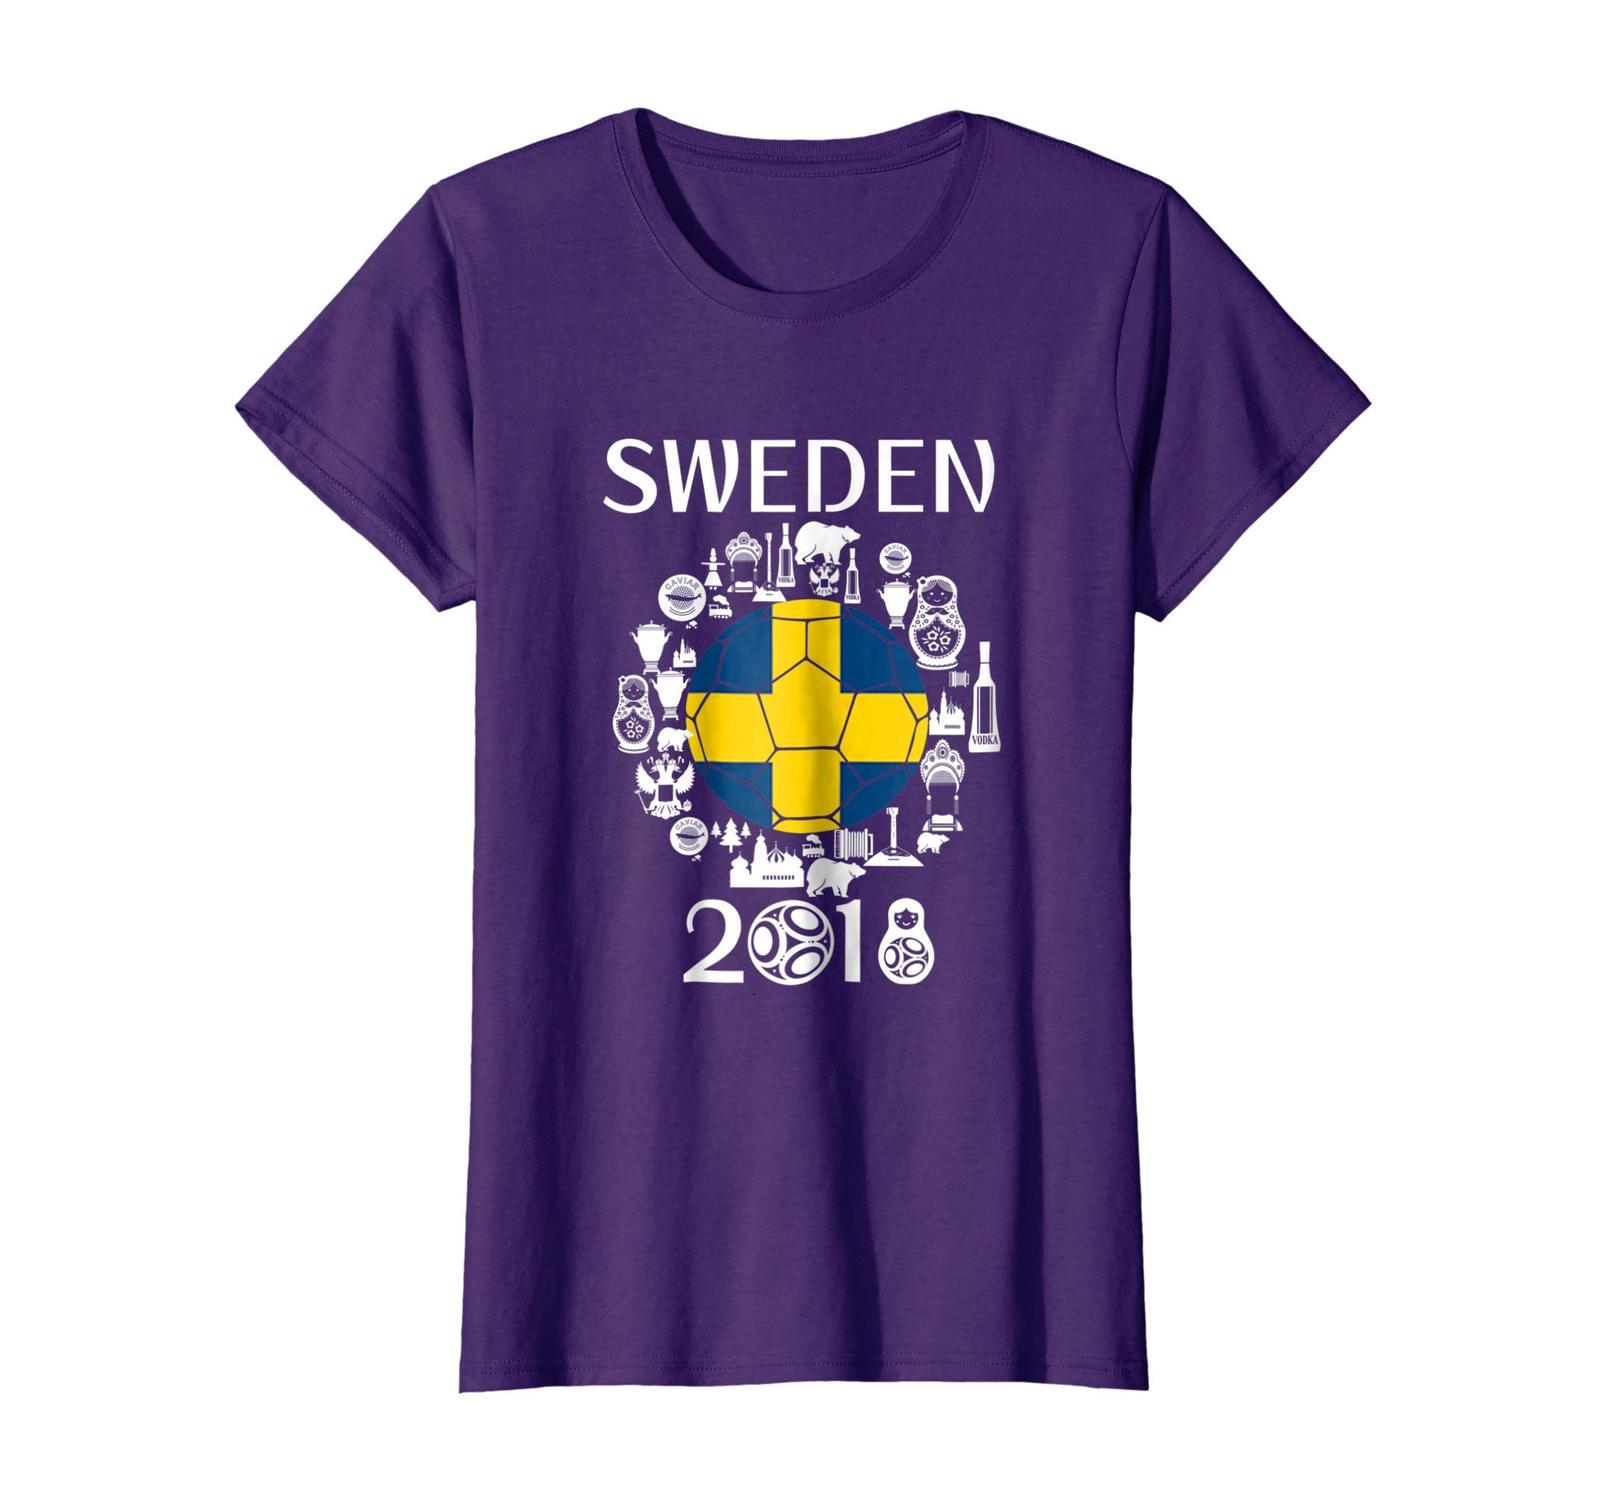 Sport Shirts - Sweden Soccer Jersey Tshirt World Football 2018 Gift Fan Wowen